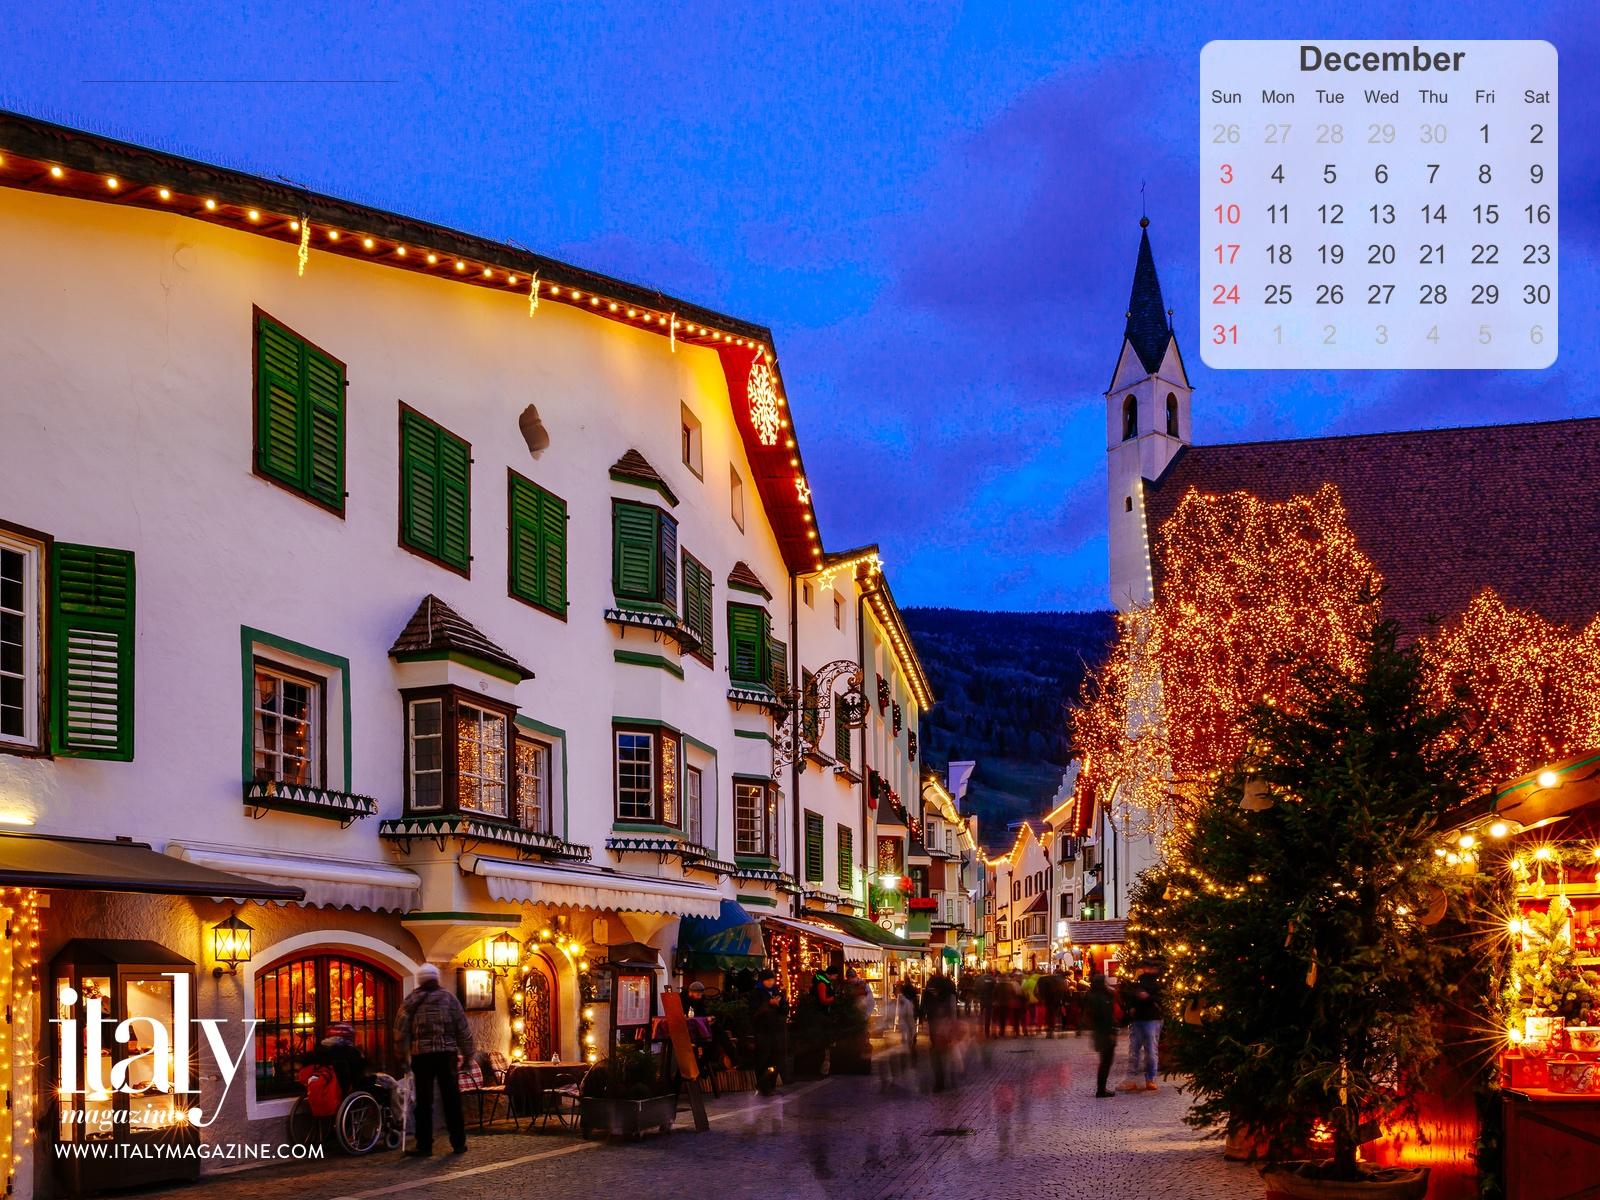 Usa Hd Wallpaper Download Wallpaper Calendar December 2017 Italy Magazine